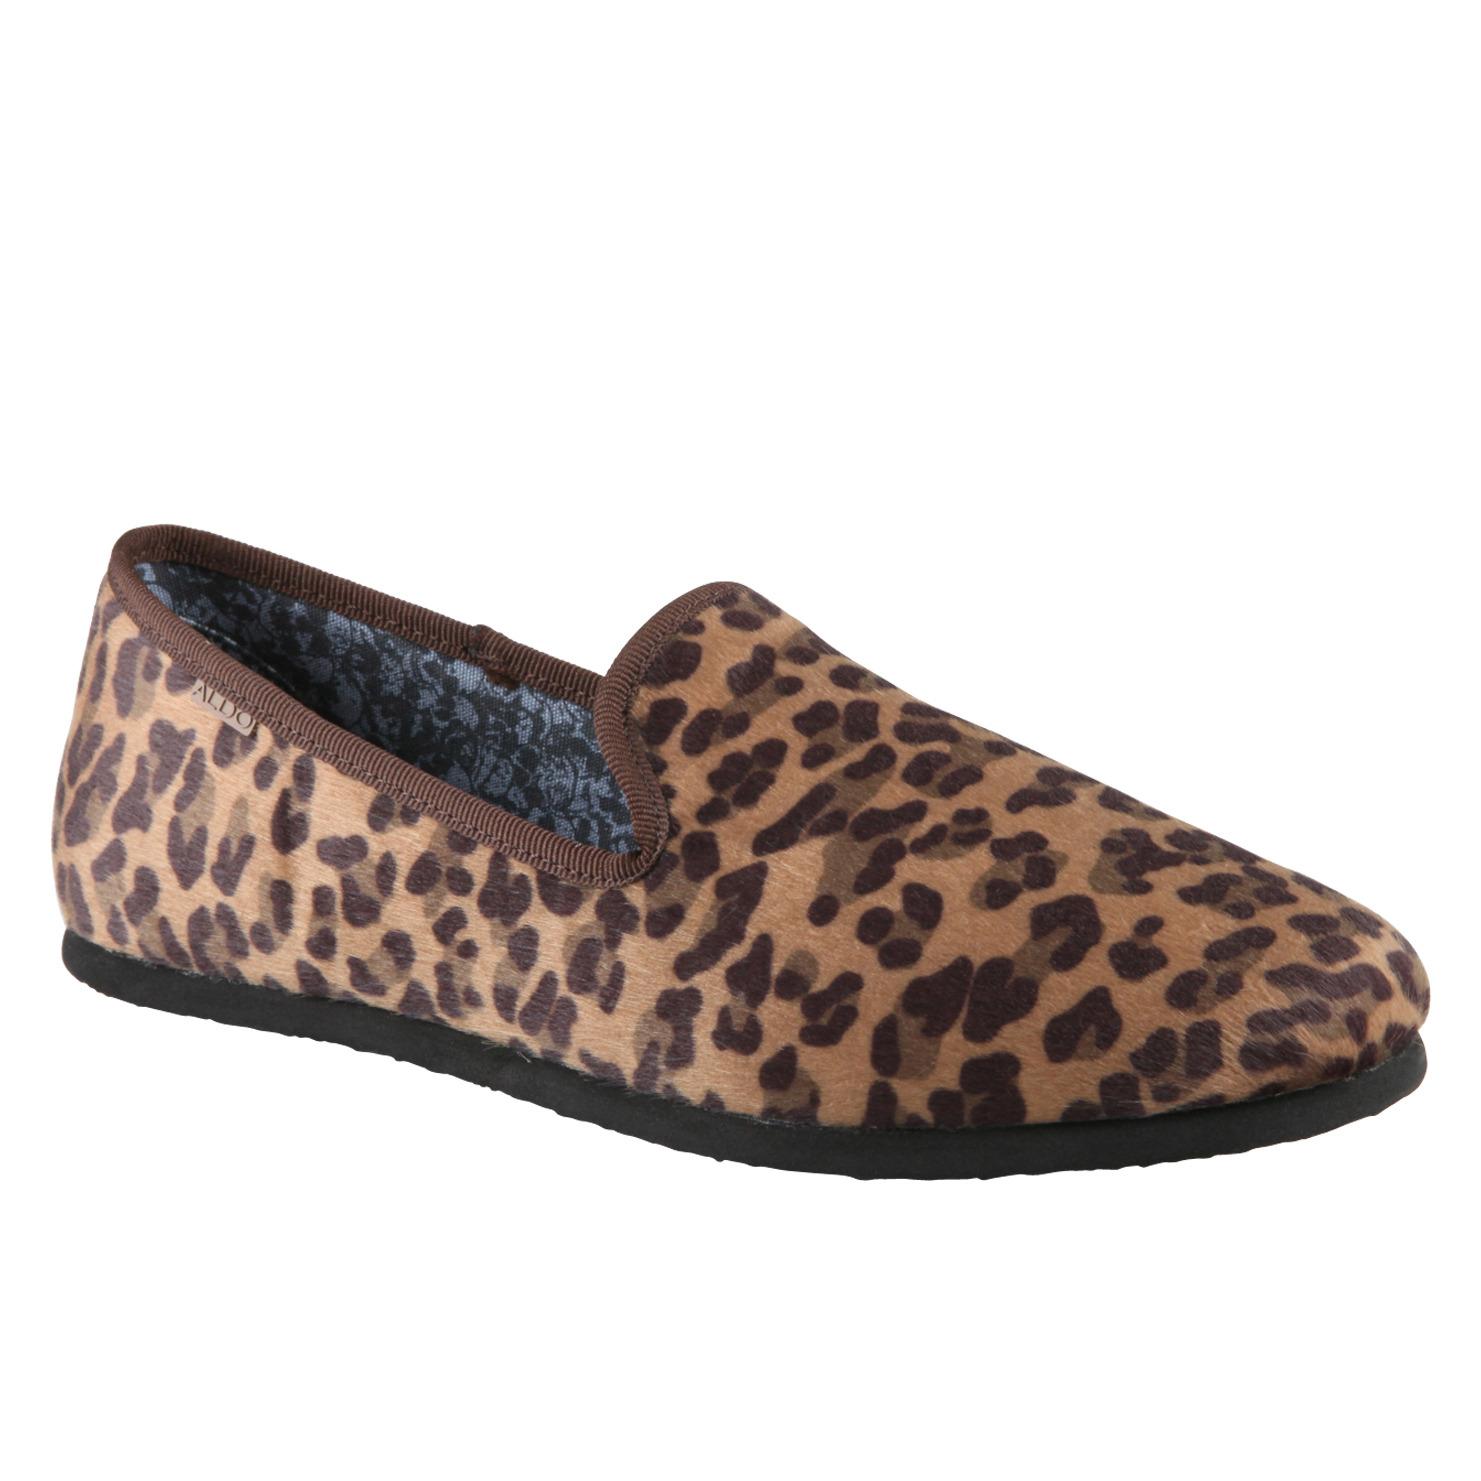 fd8497bac467 The X-Stylez  Collection Critique  ALDO Velvet Slippers For Fall 2012